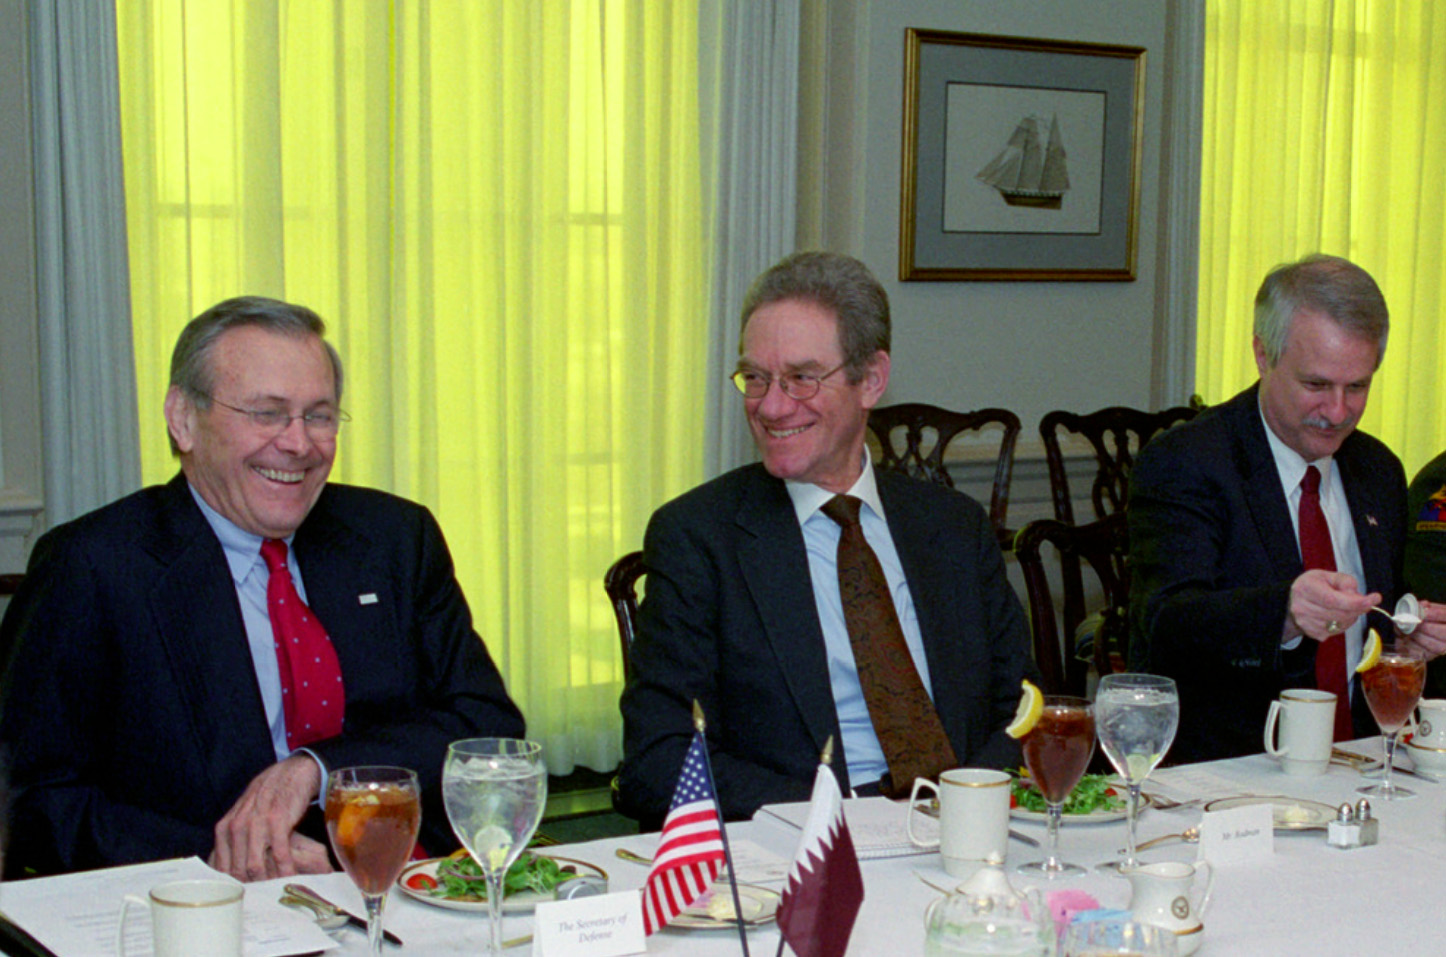 Donald H. Rumsfeld (left) shares a laugh with Peter W. Rodman (center)